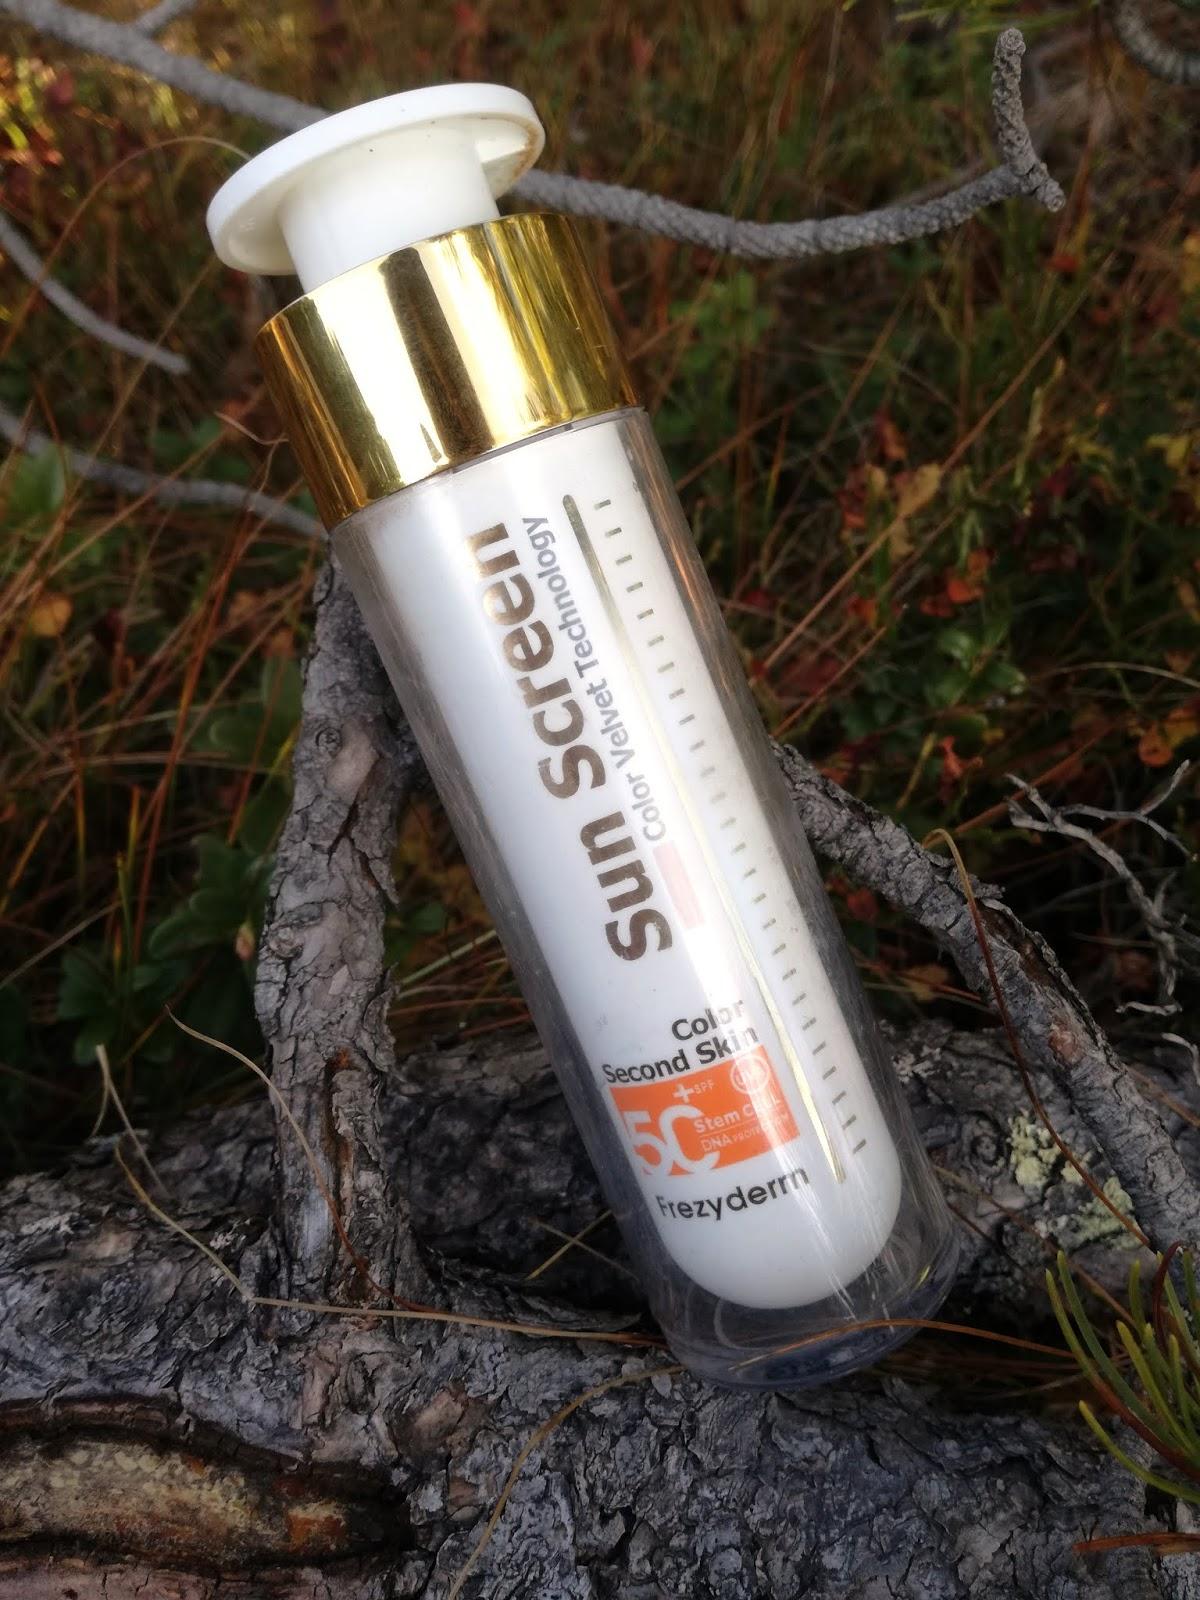 frezyderm-velvet-technology-sunscreen